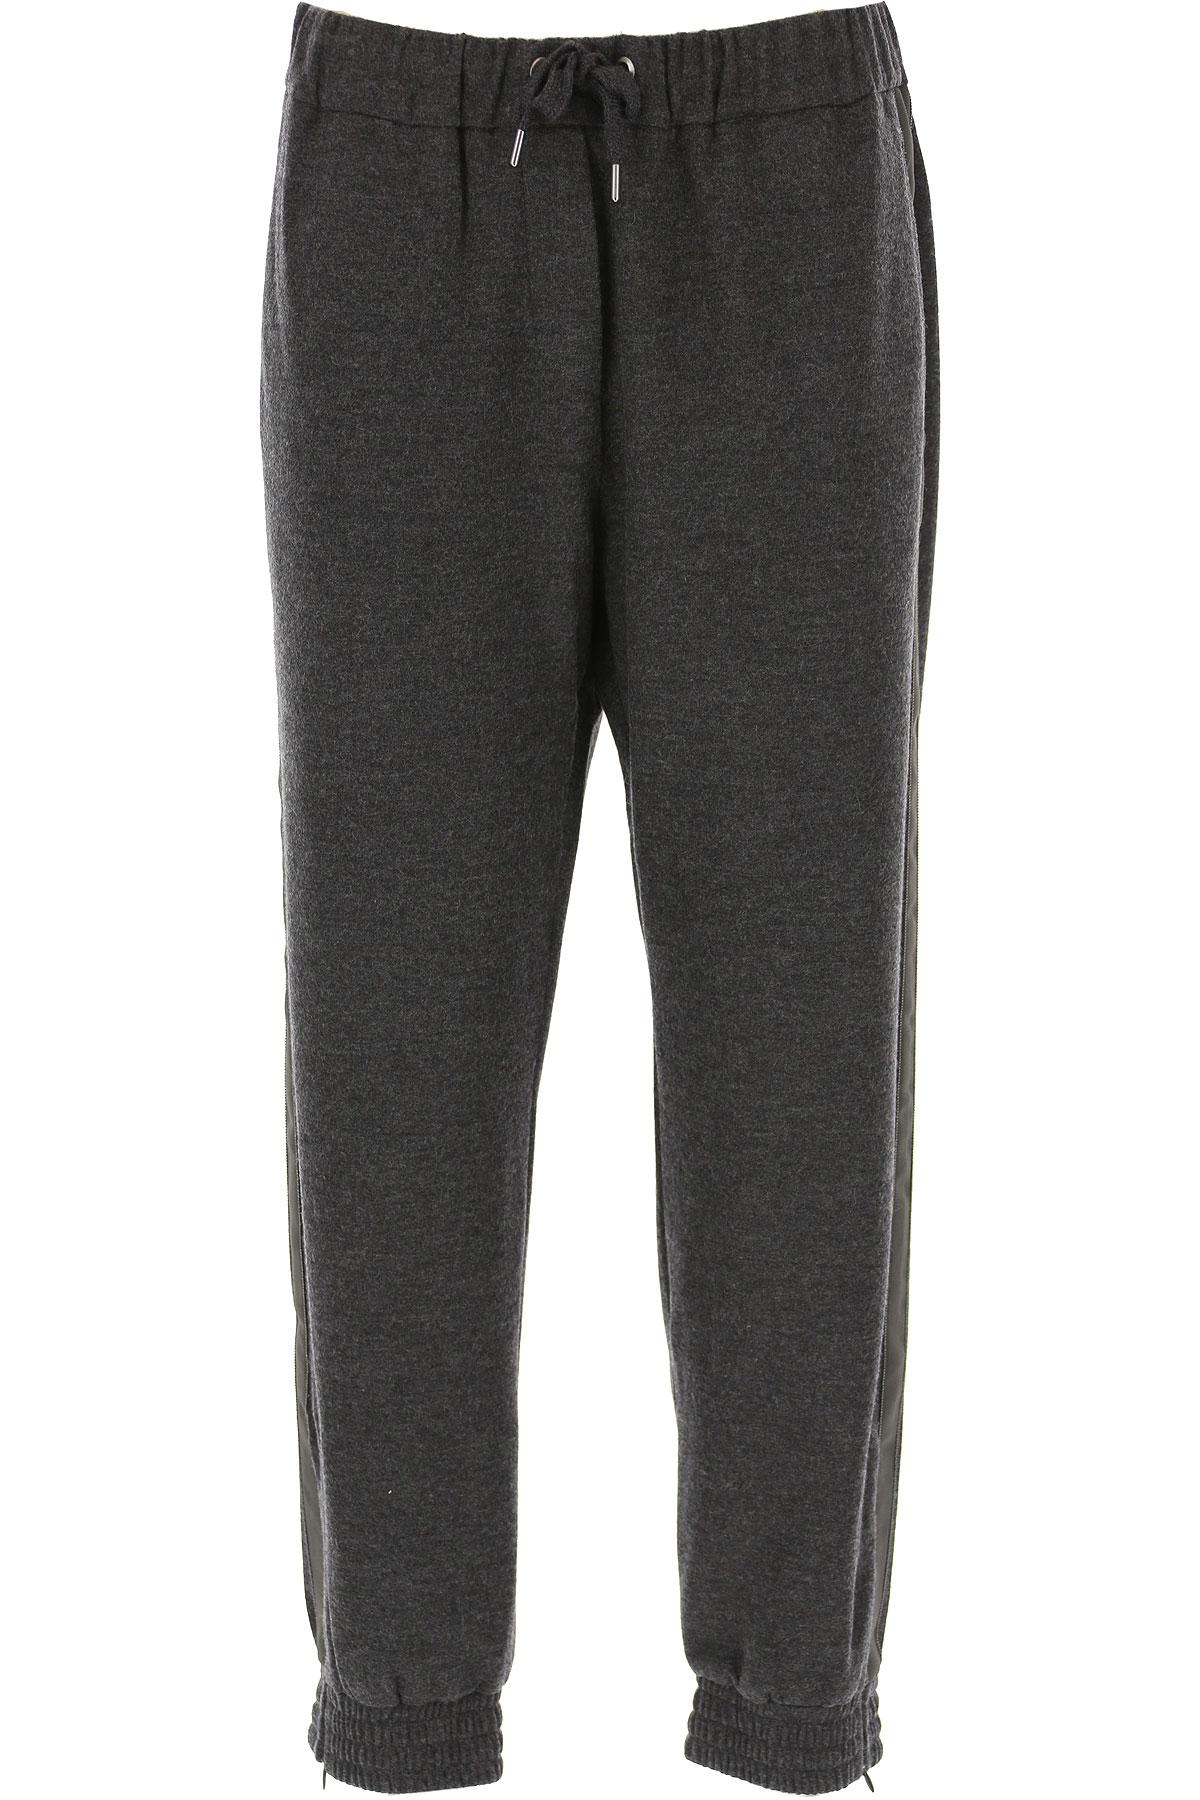 Brunello Cucinelli Pants for Women On Sale, Dark Grey, Cashmere, 2019, M (IT 42 ) L (IT 44 )